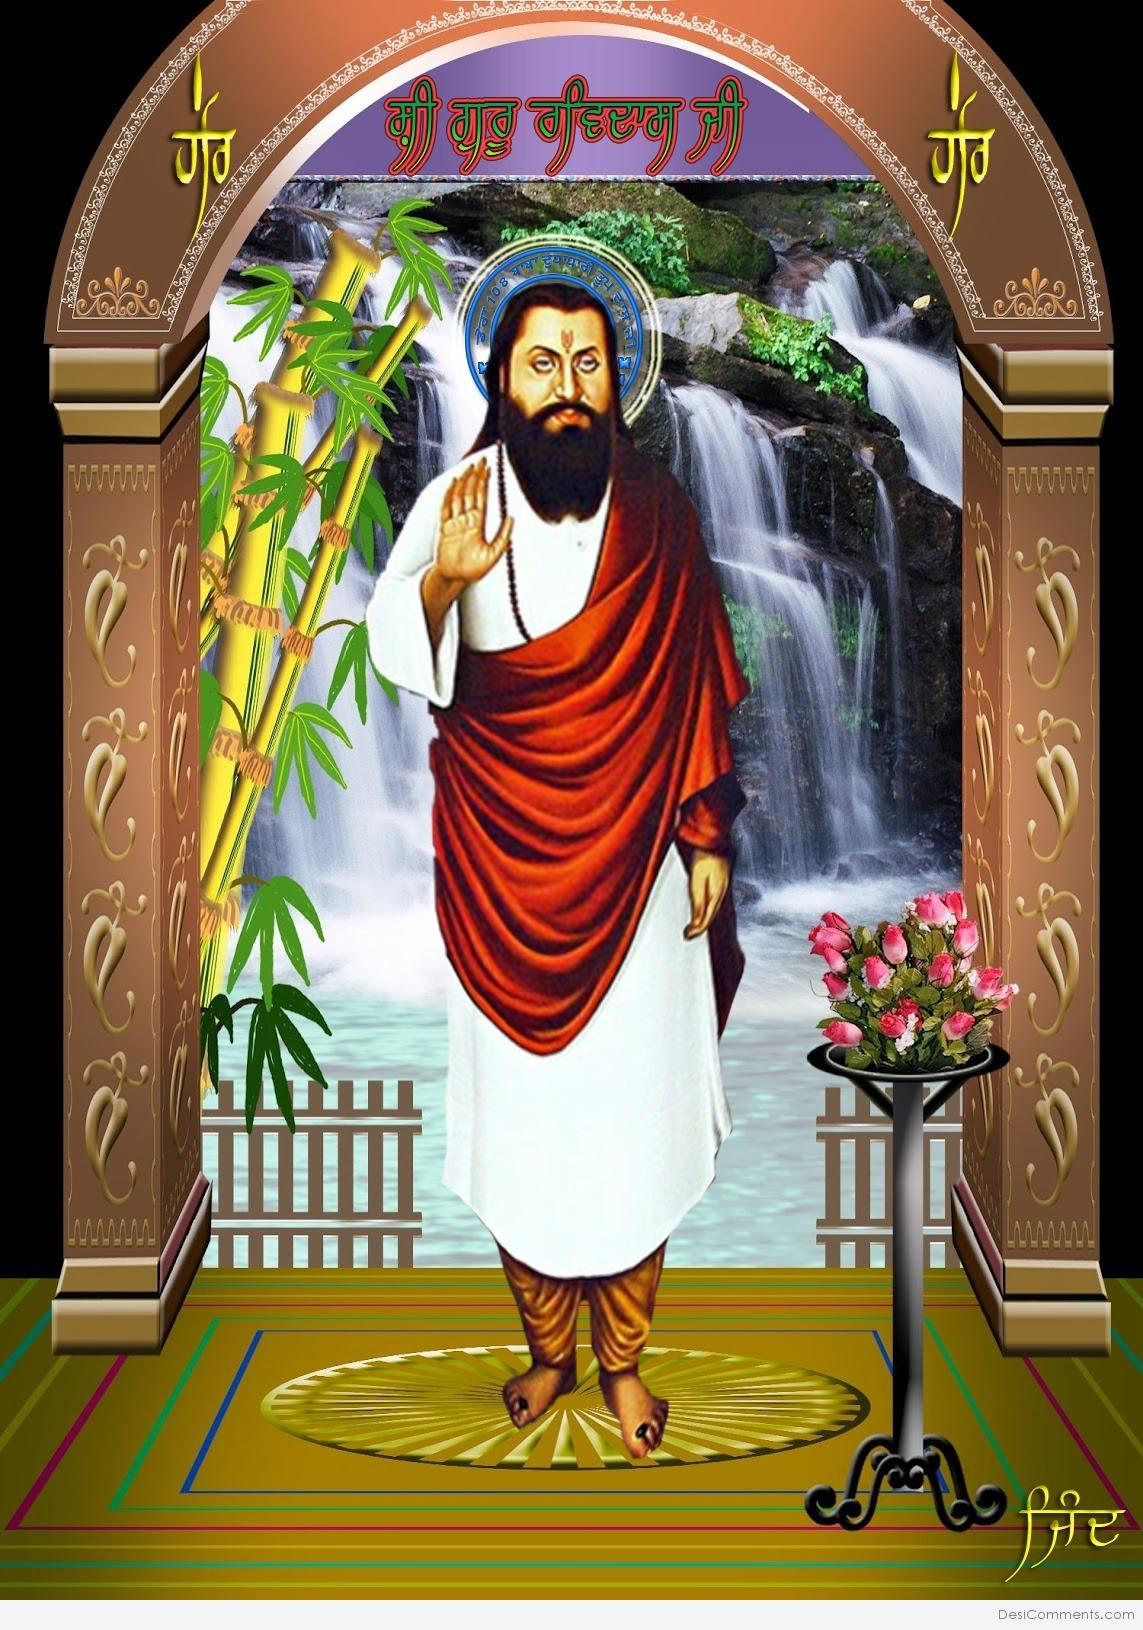 Love Quotes With Wallpapers In Hindi Shri Guru Ravidas Ji Desicomments Com